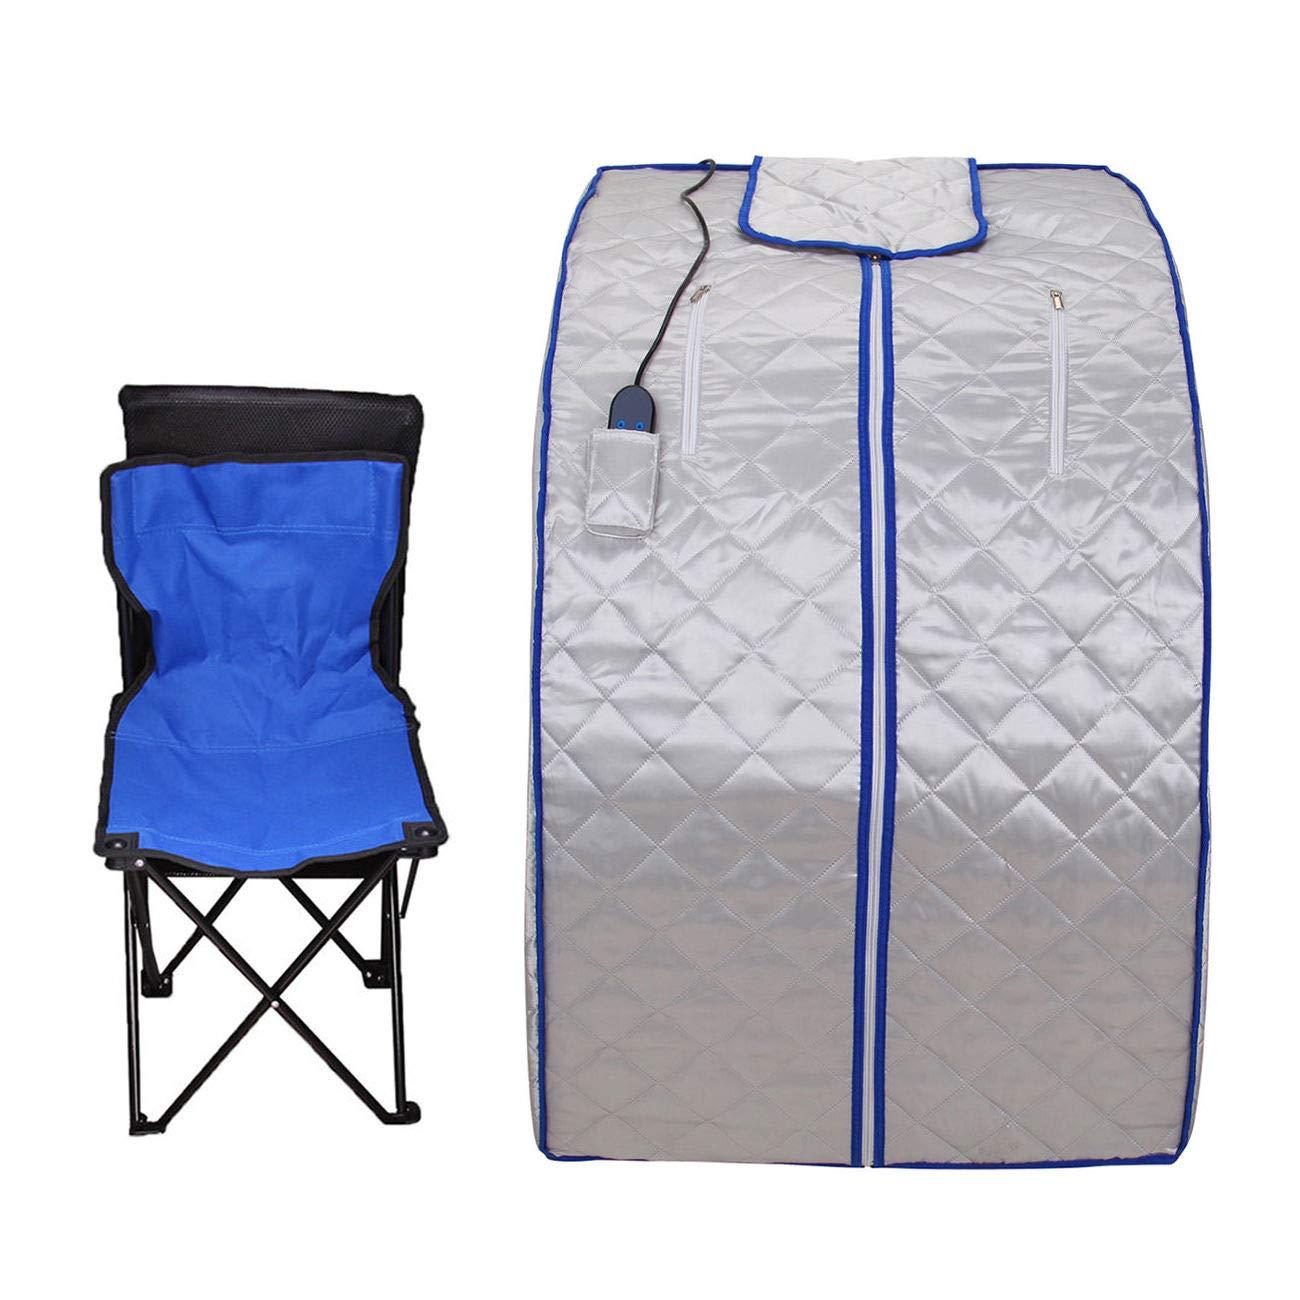 Ridgeyard 600W Portable FIR Far Infrared SPA Sauna Room Weight Loss Detox Tent Foot Heating pad